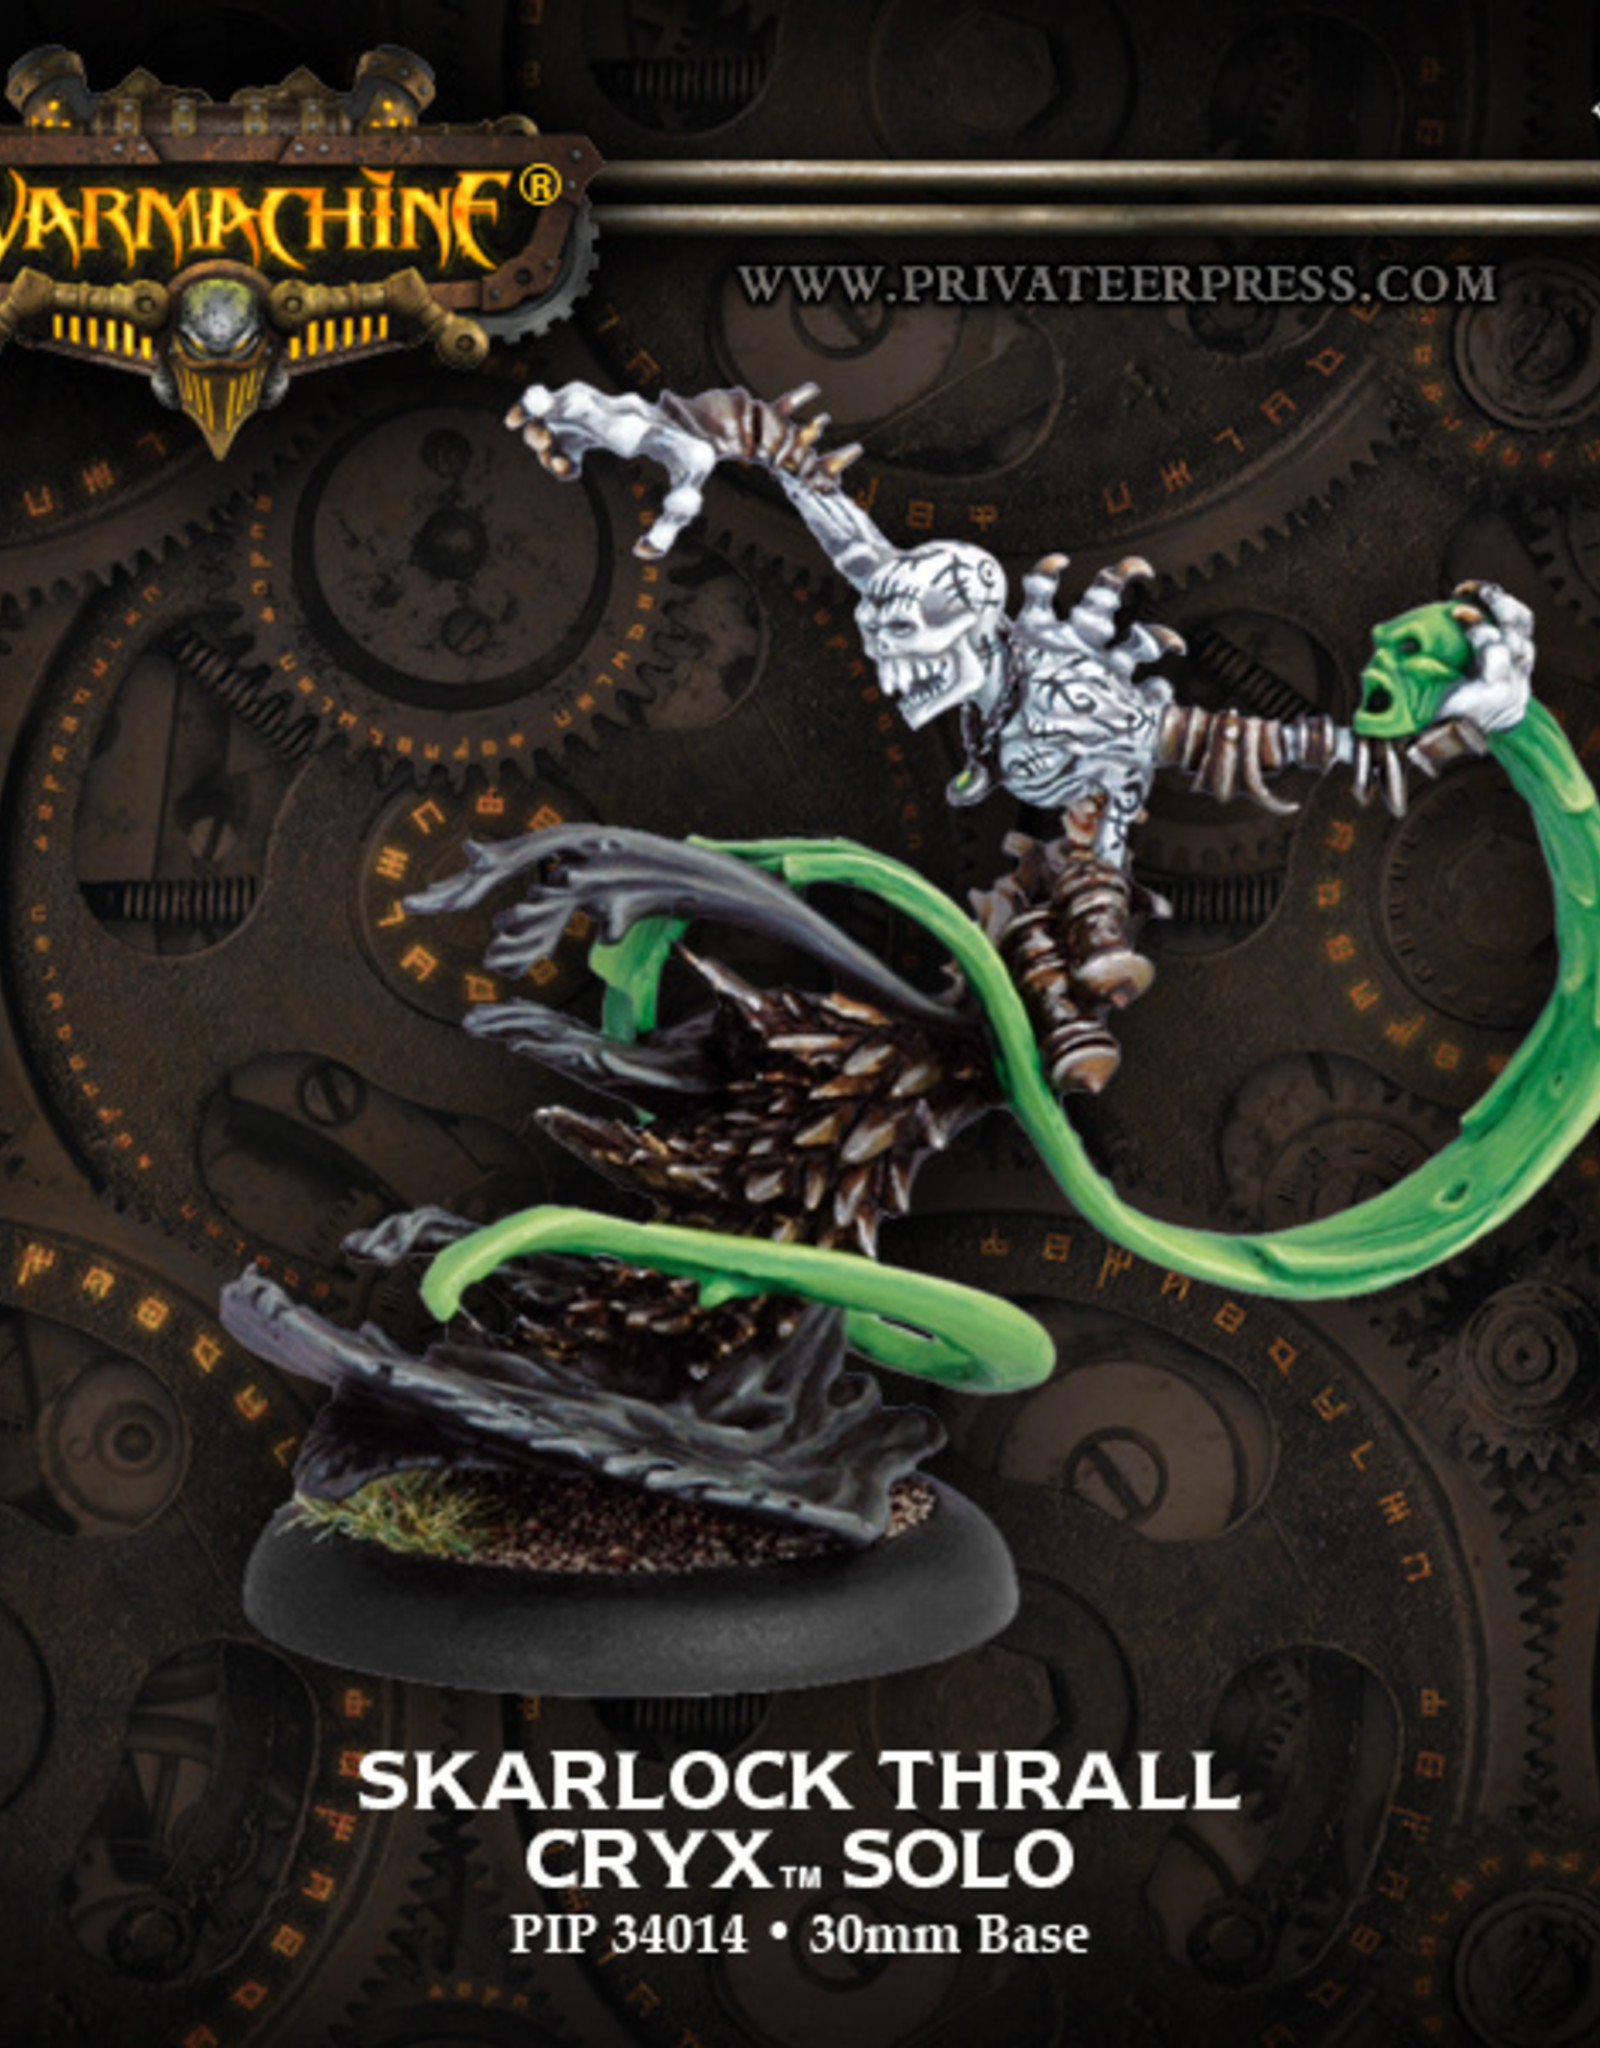 Privateer Press Skarlock Thrall